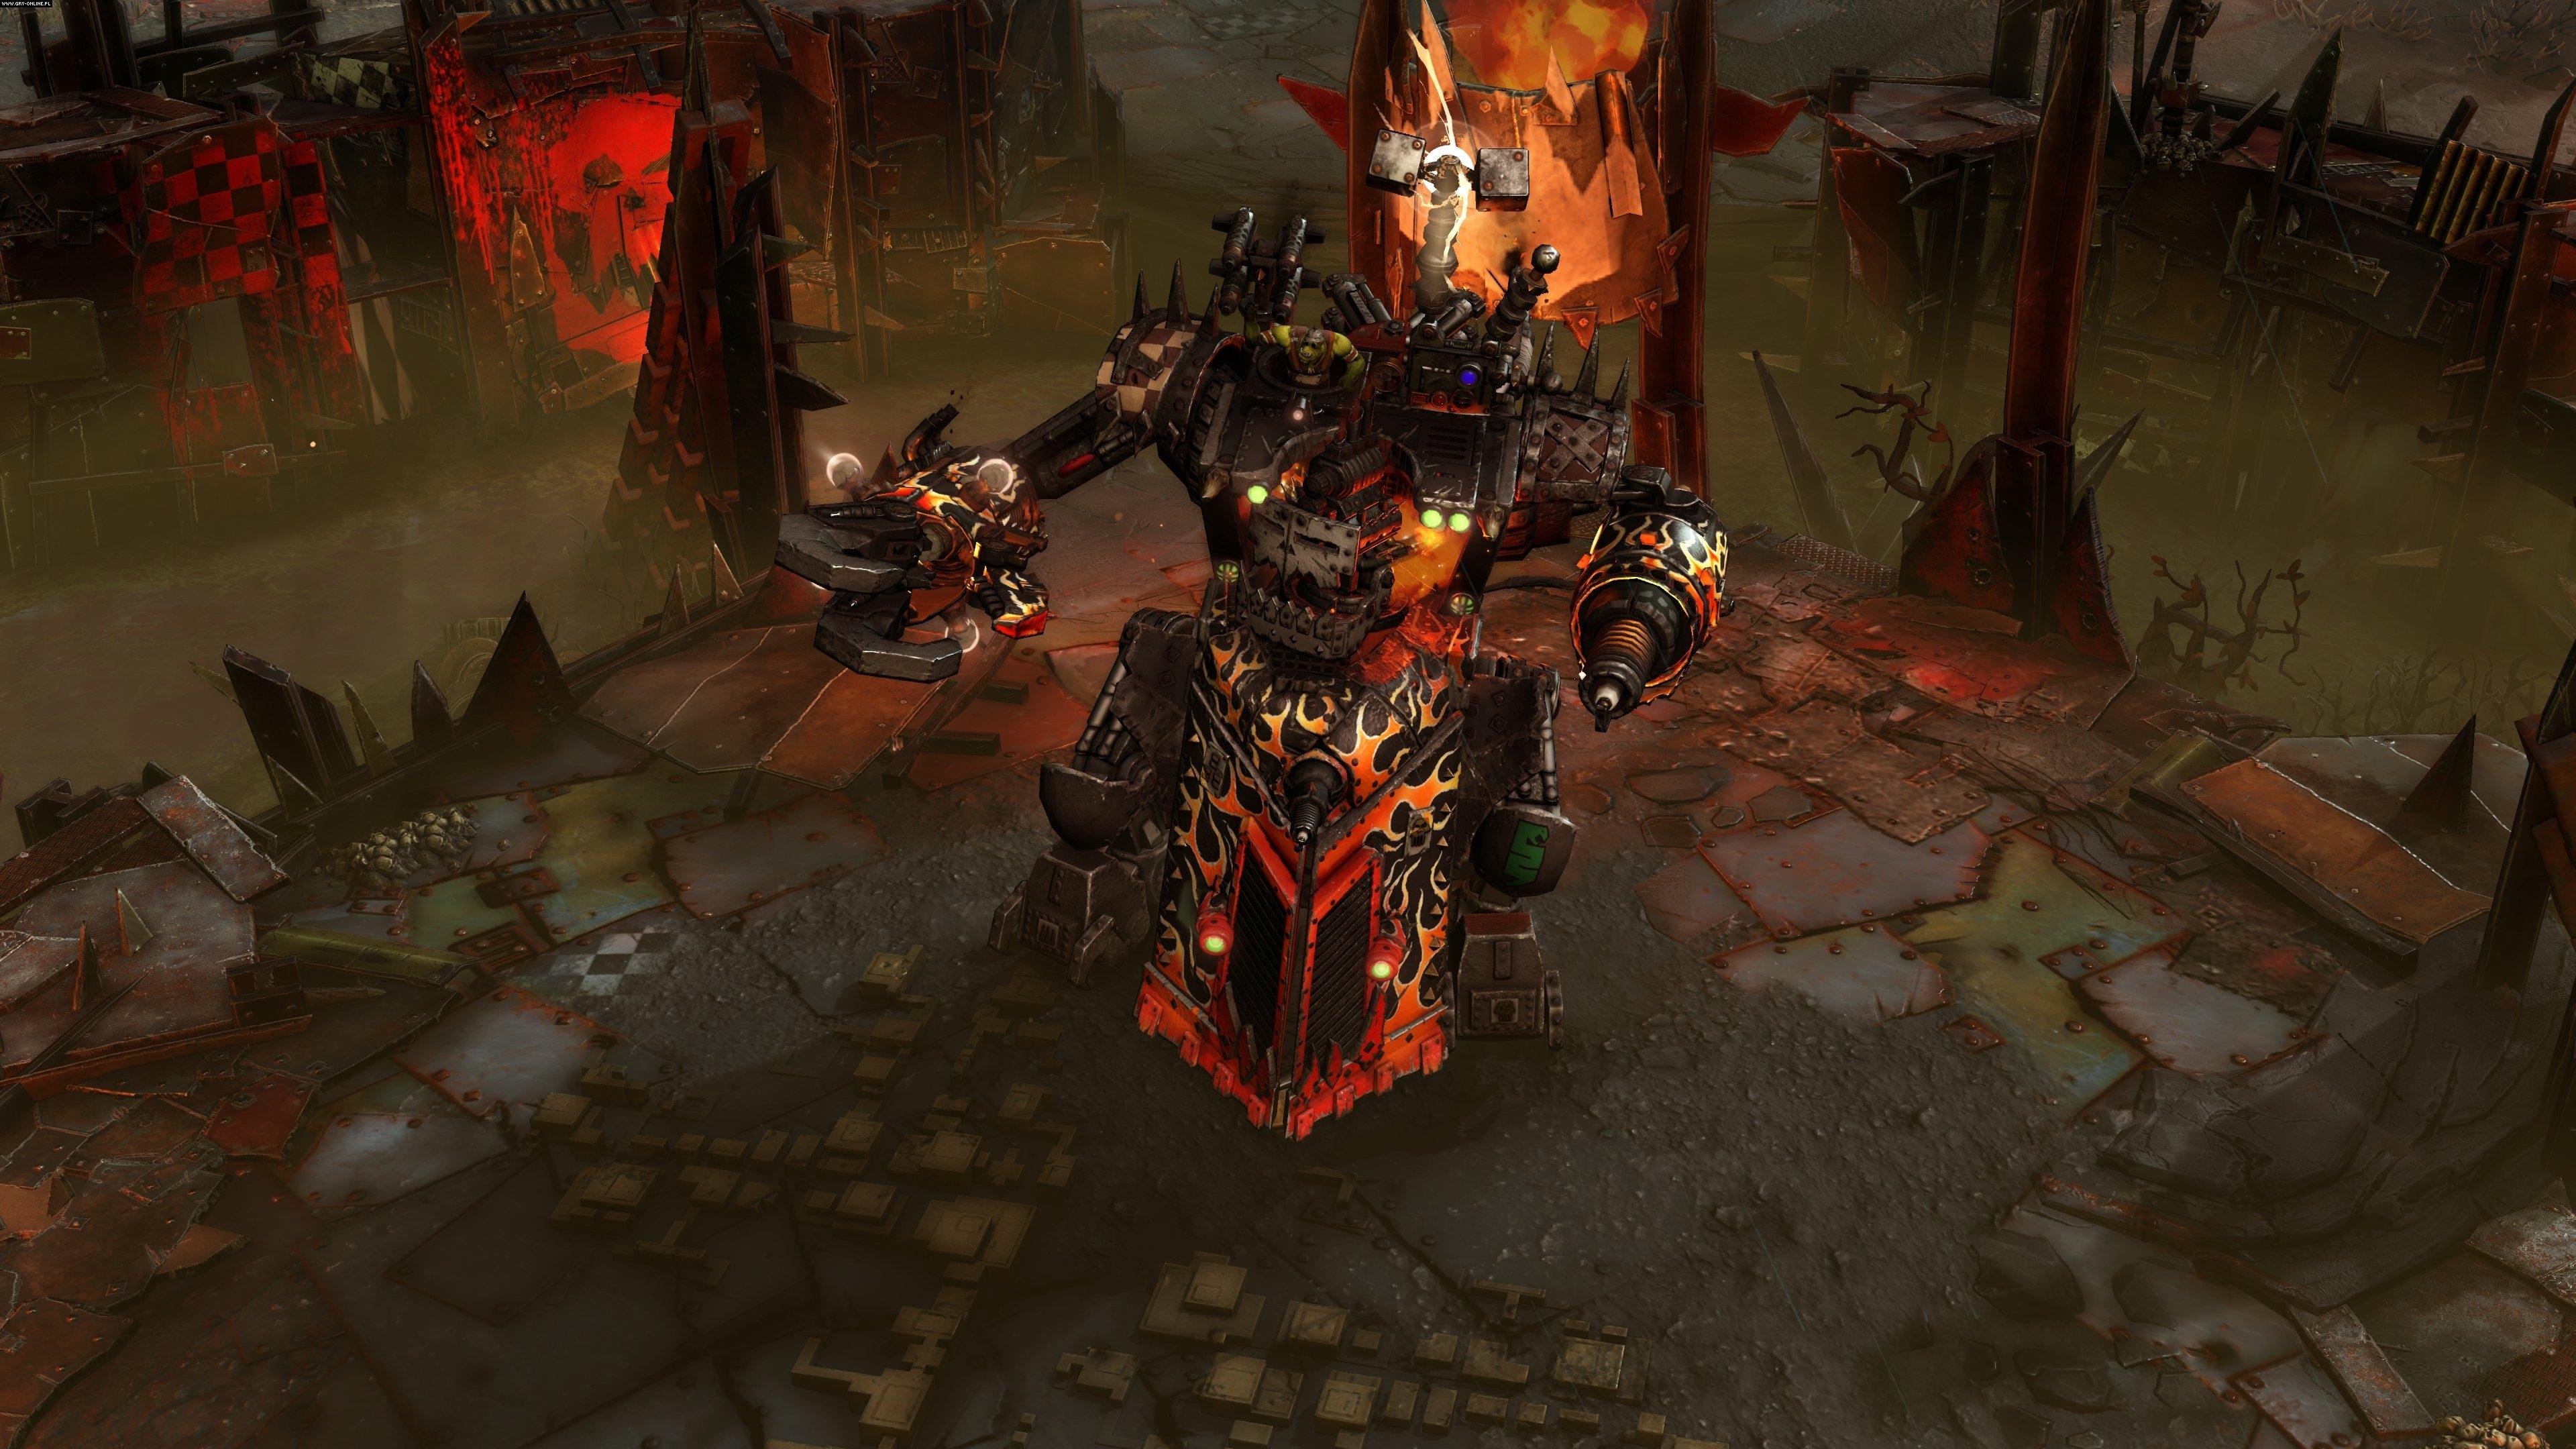 Warhammer 40,000: Dawn of War III PC Games Image 5/32, Relic Entertainment, SEGA